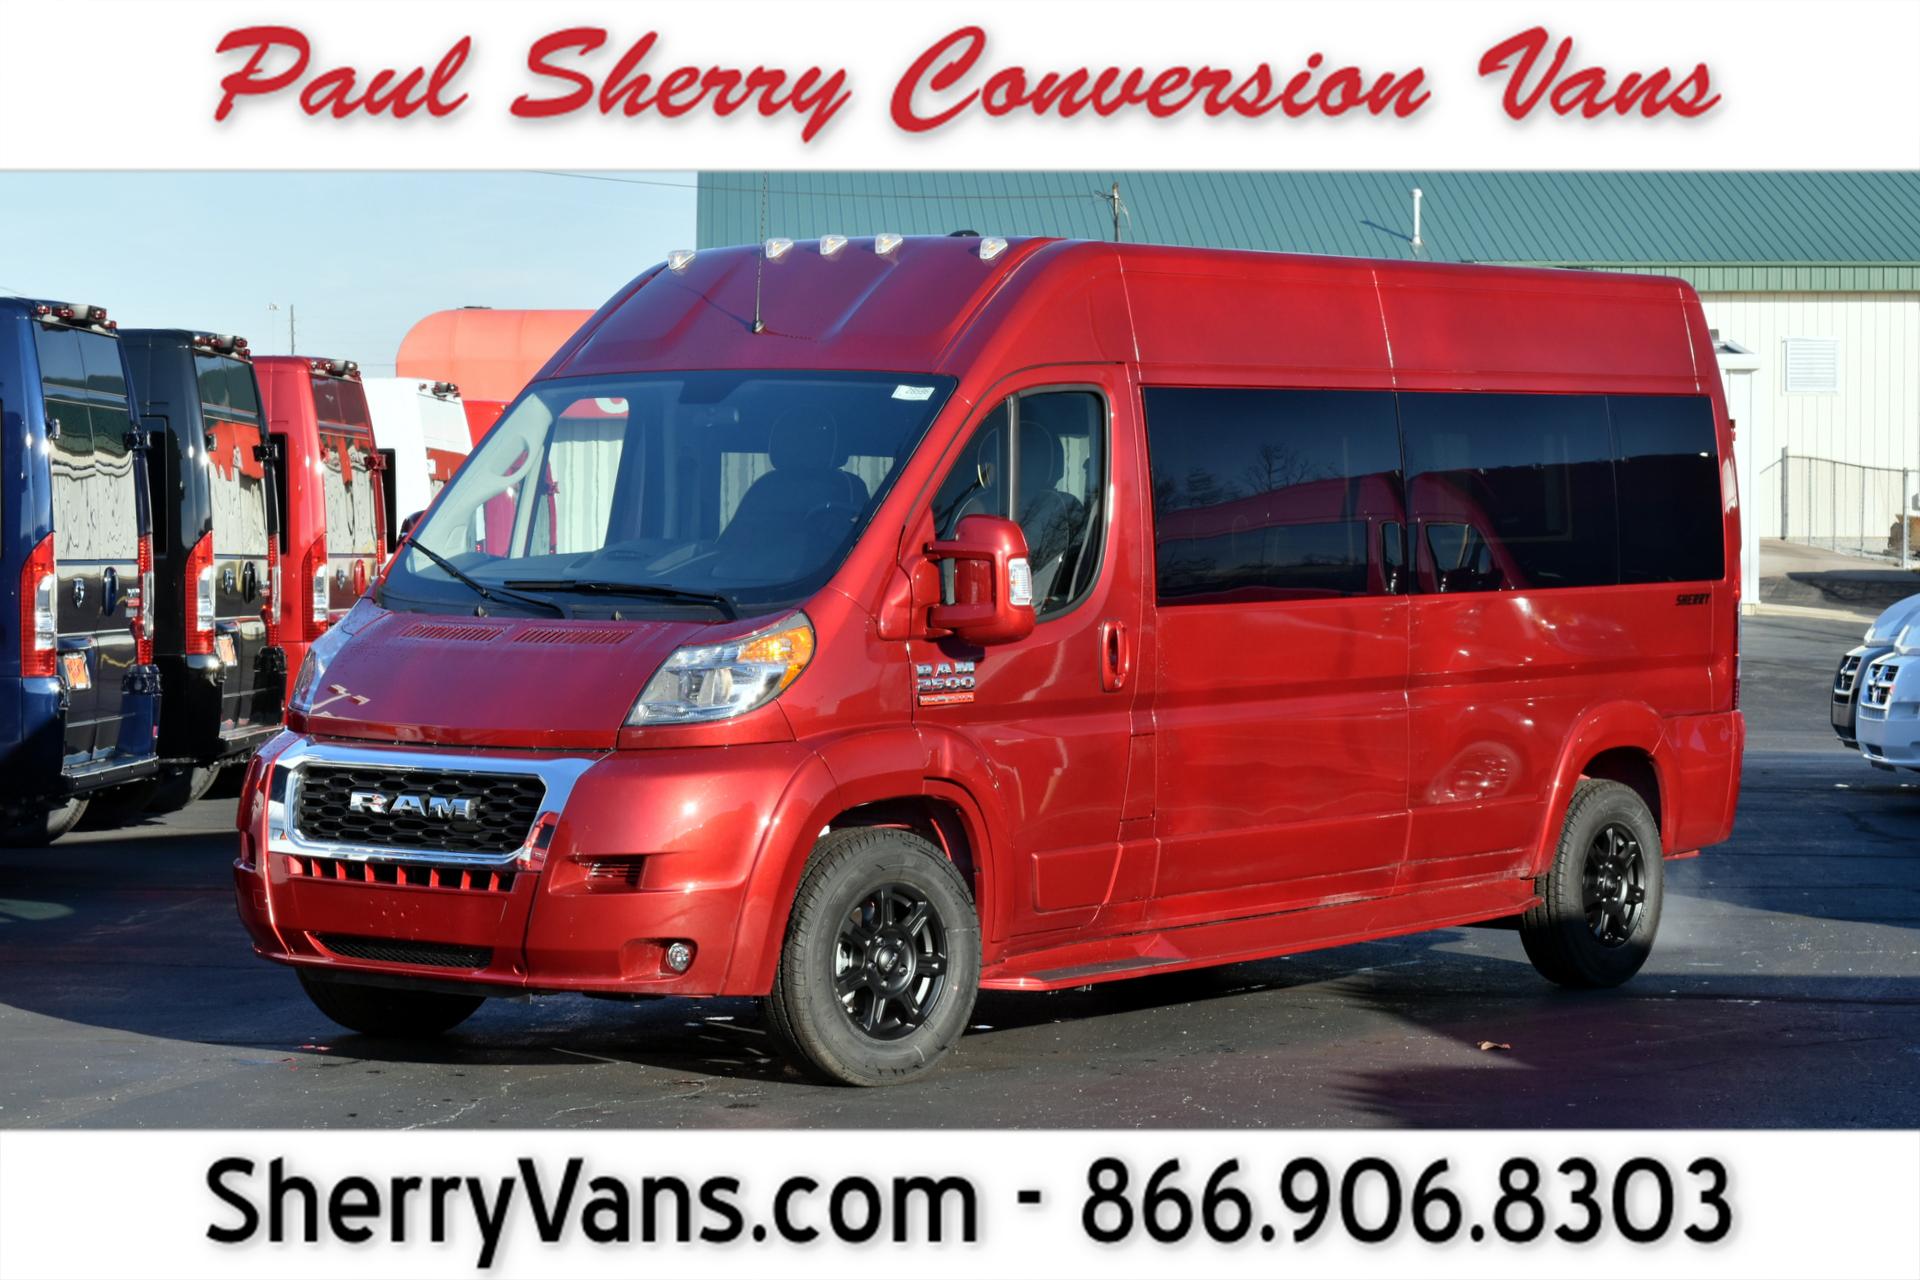 2019 Ram Conversion Van – Sherry Vans 9 Passenger | 28596T